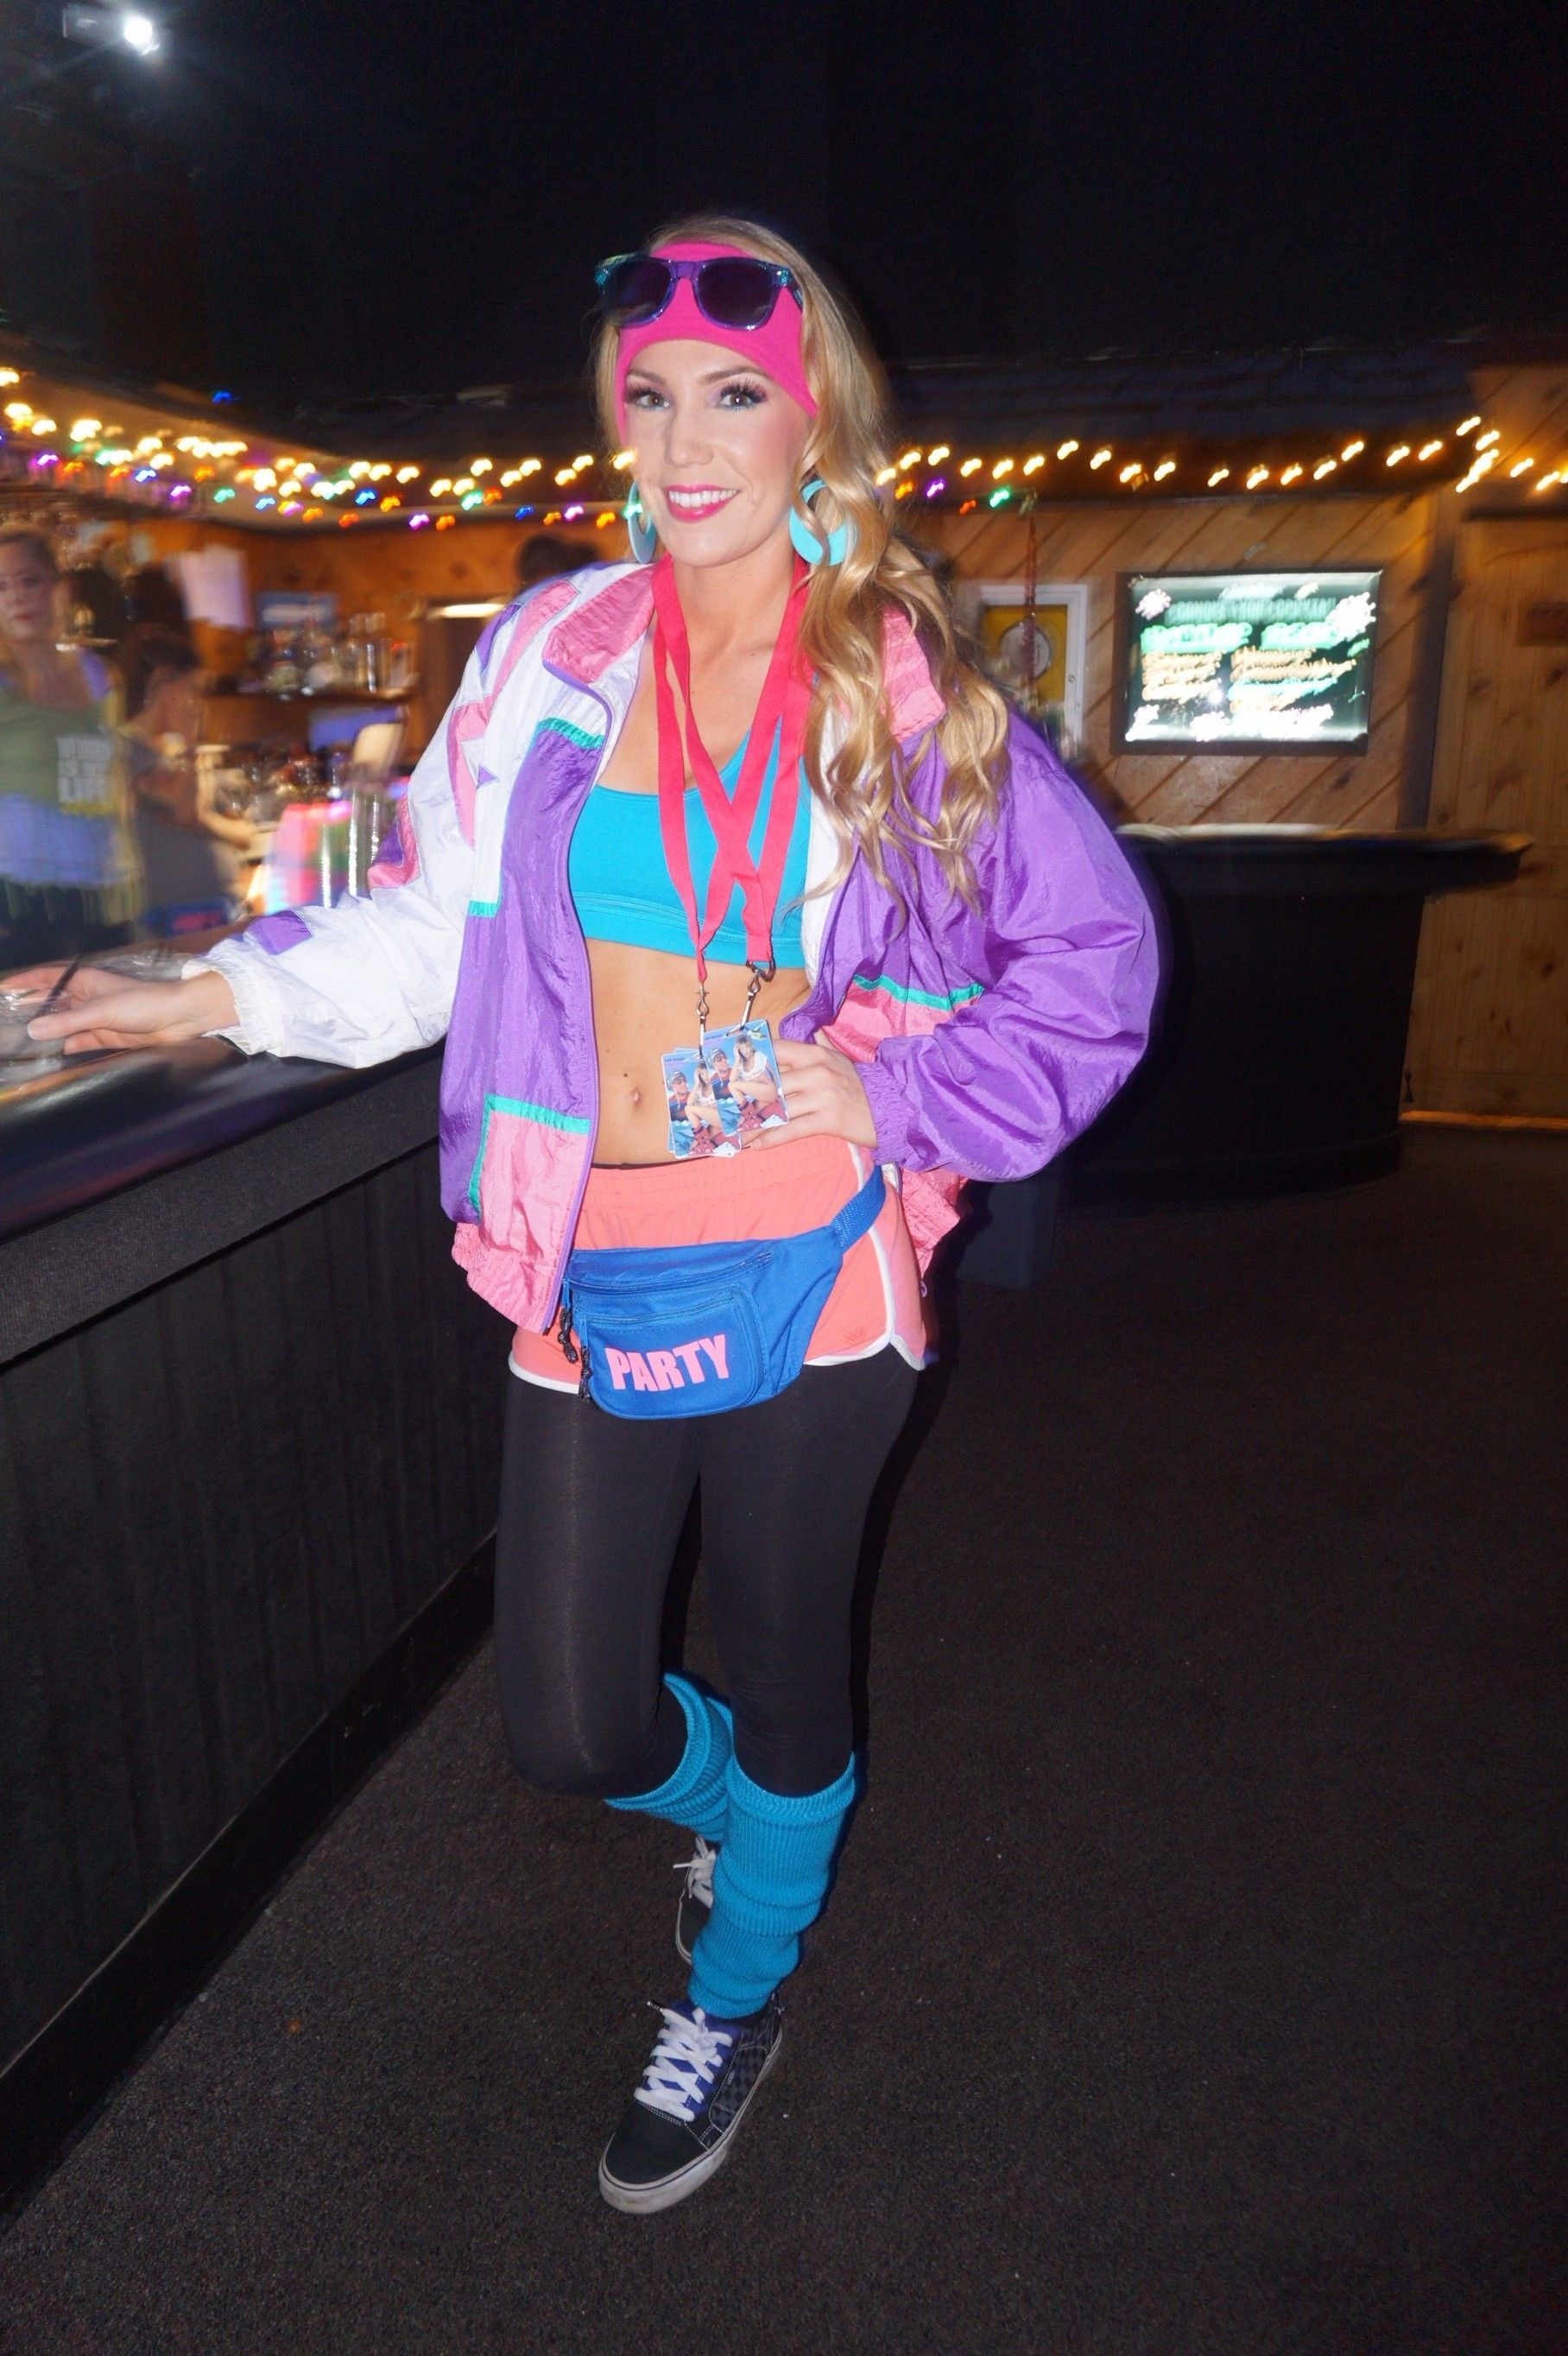 Photo of 80's Ski party #80s #ski #hotdogskibunny #80spartyoutfits 80…